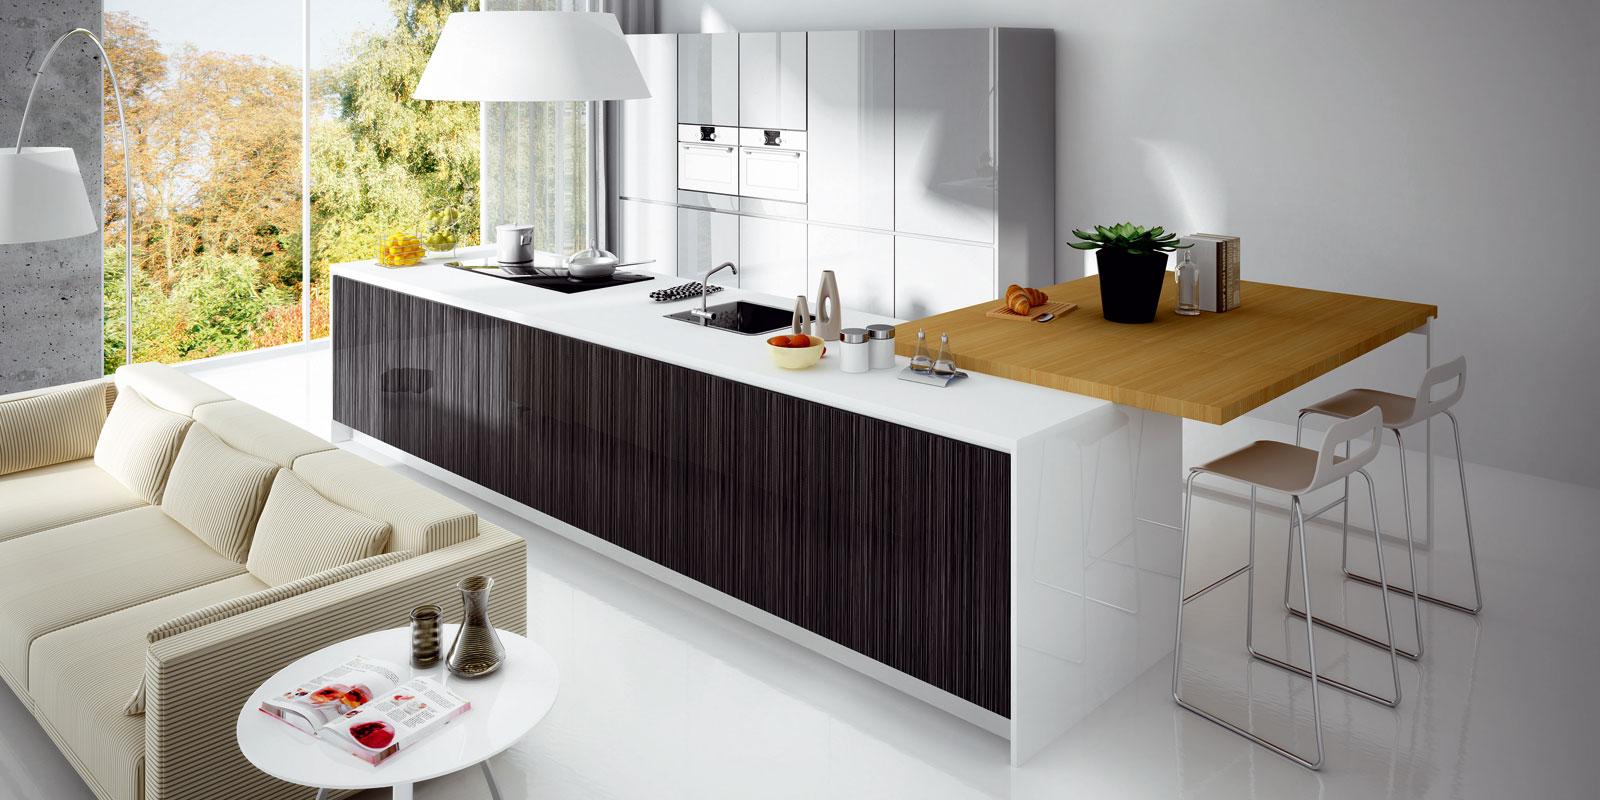 Alvic muebles de cocina las palmas dicerma pavimentos for Pavimentos para cocinas